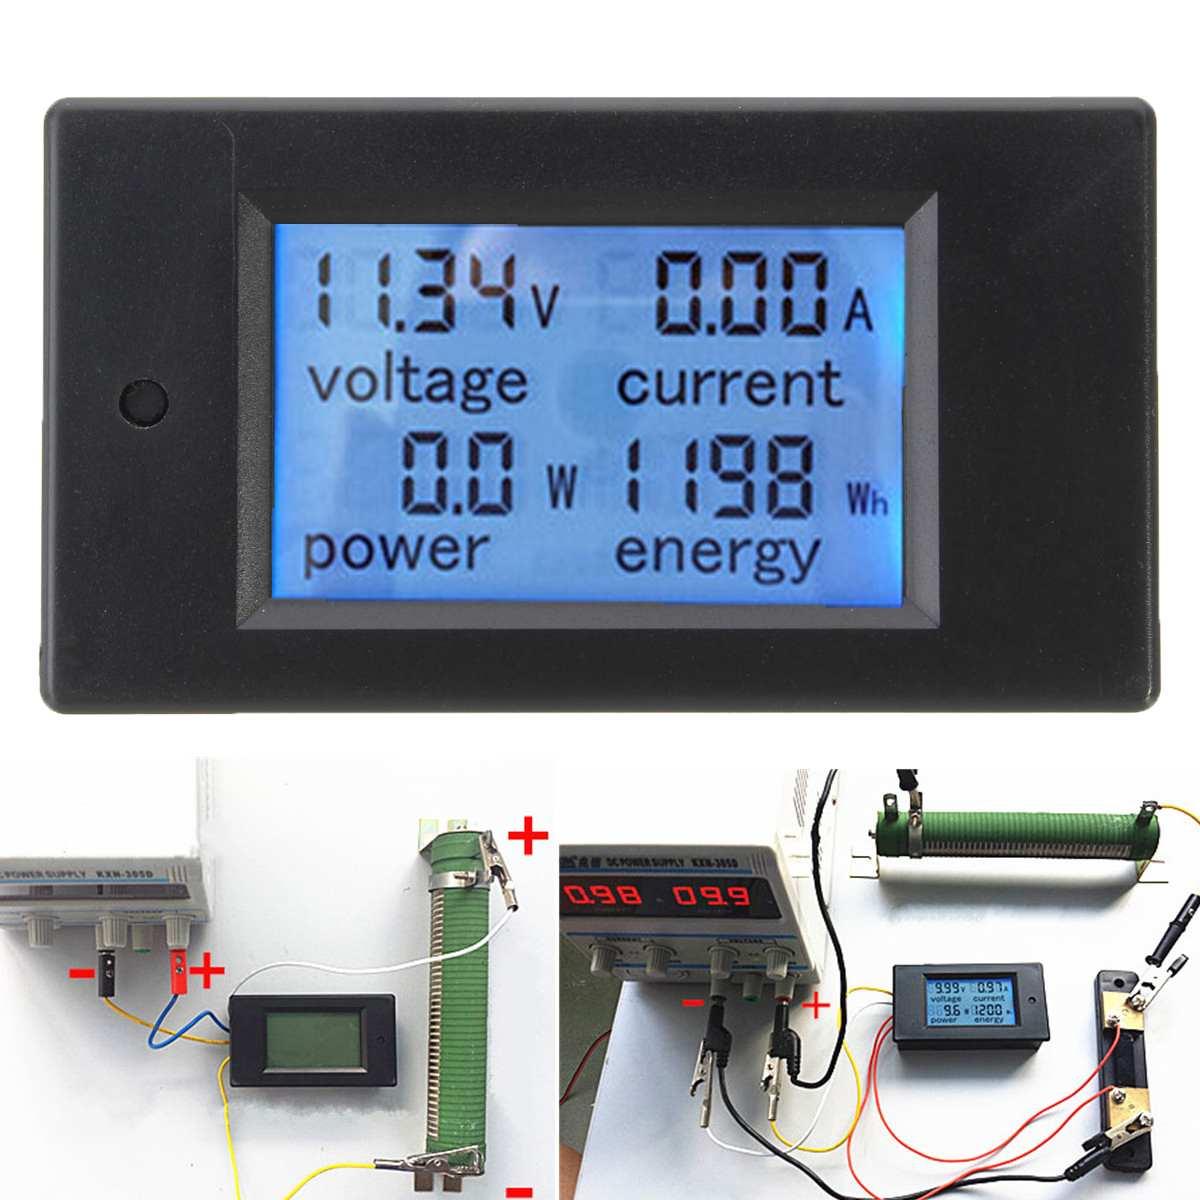 Digital Wattmeter DC 100A 4500W AC Multifunction Digital LED Power Panel Meter Monitor Power Energy Voltmeter Ammeter For DIY